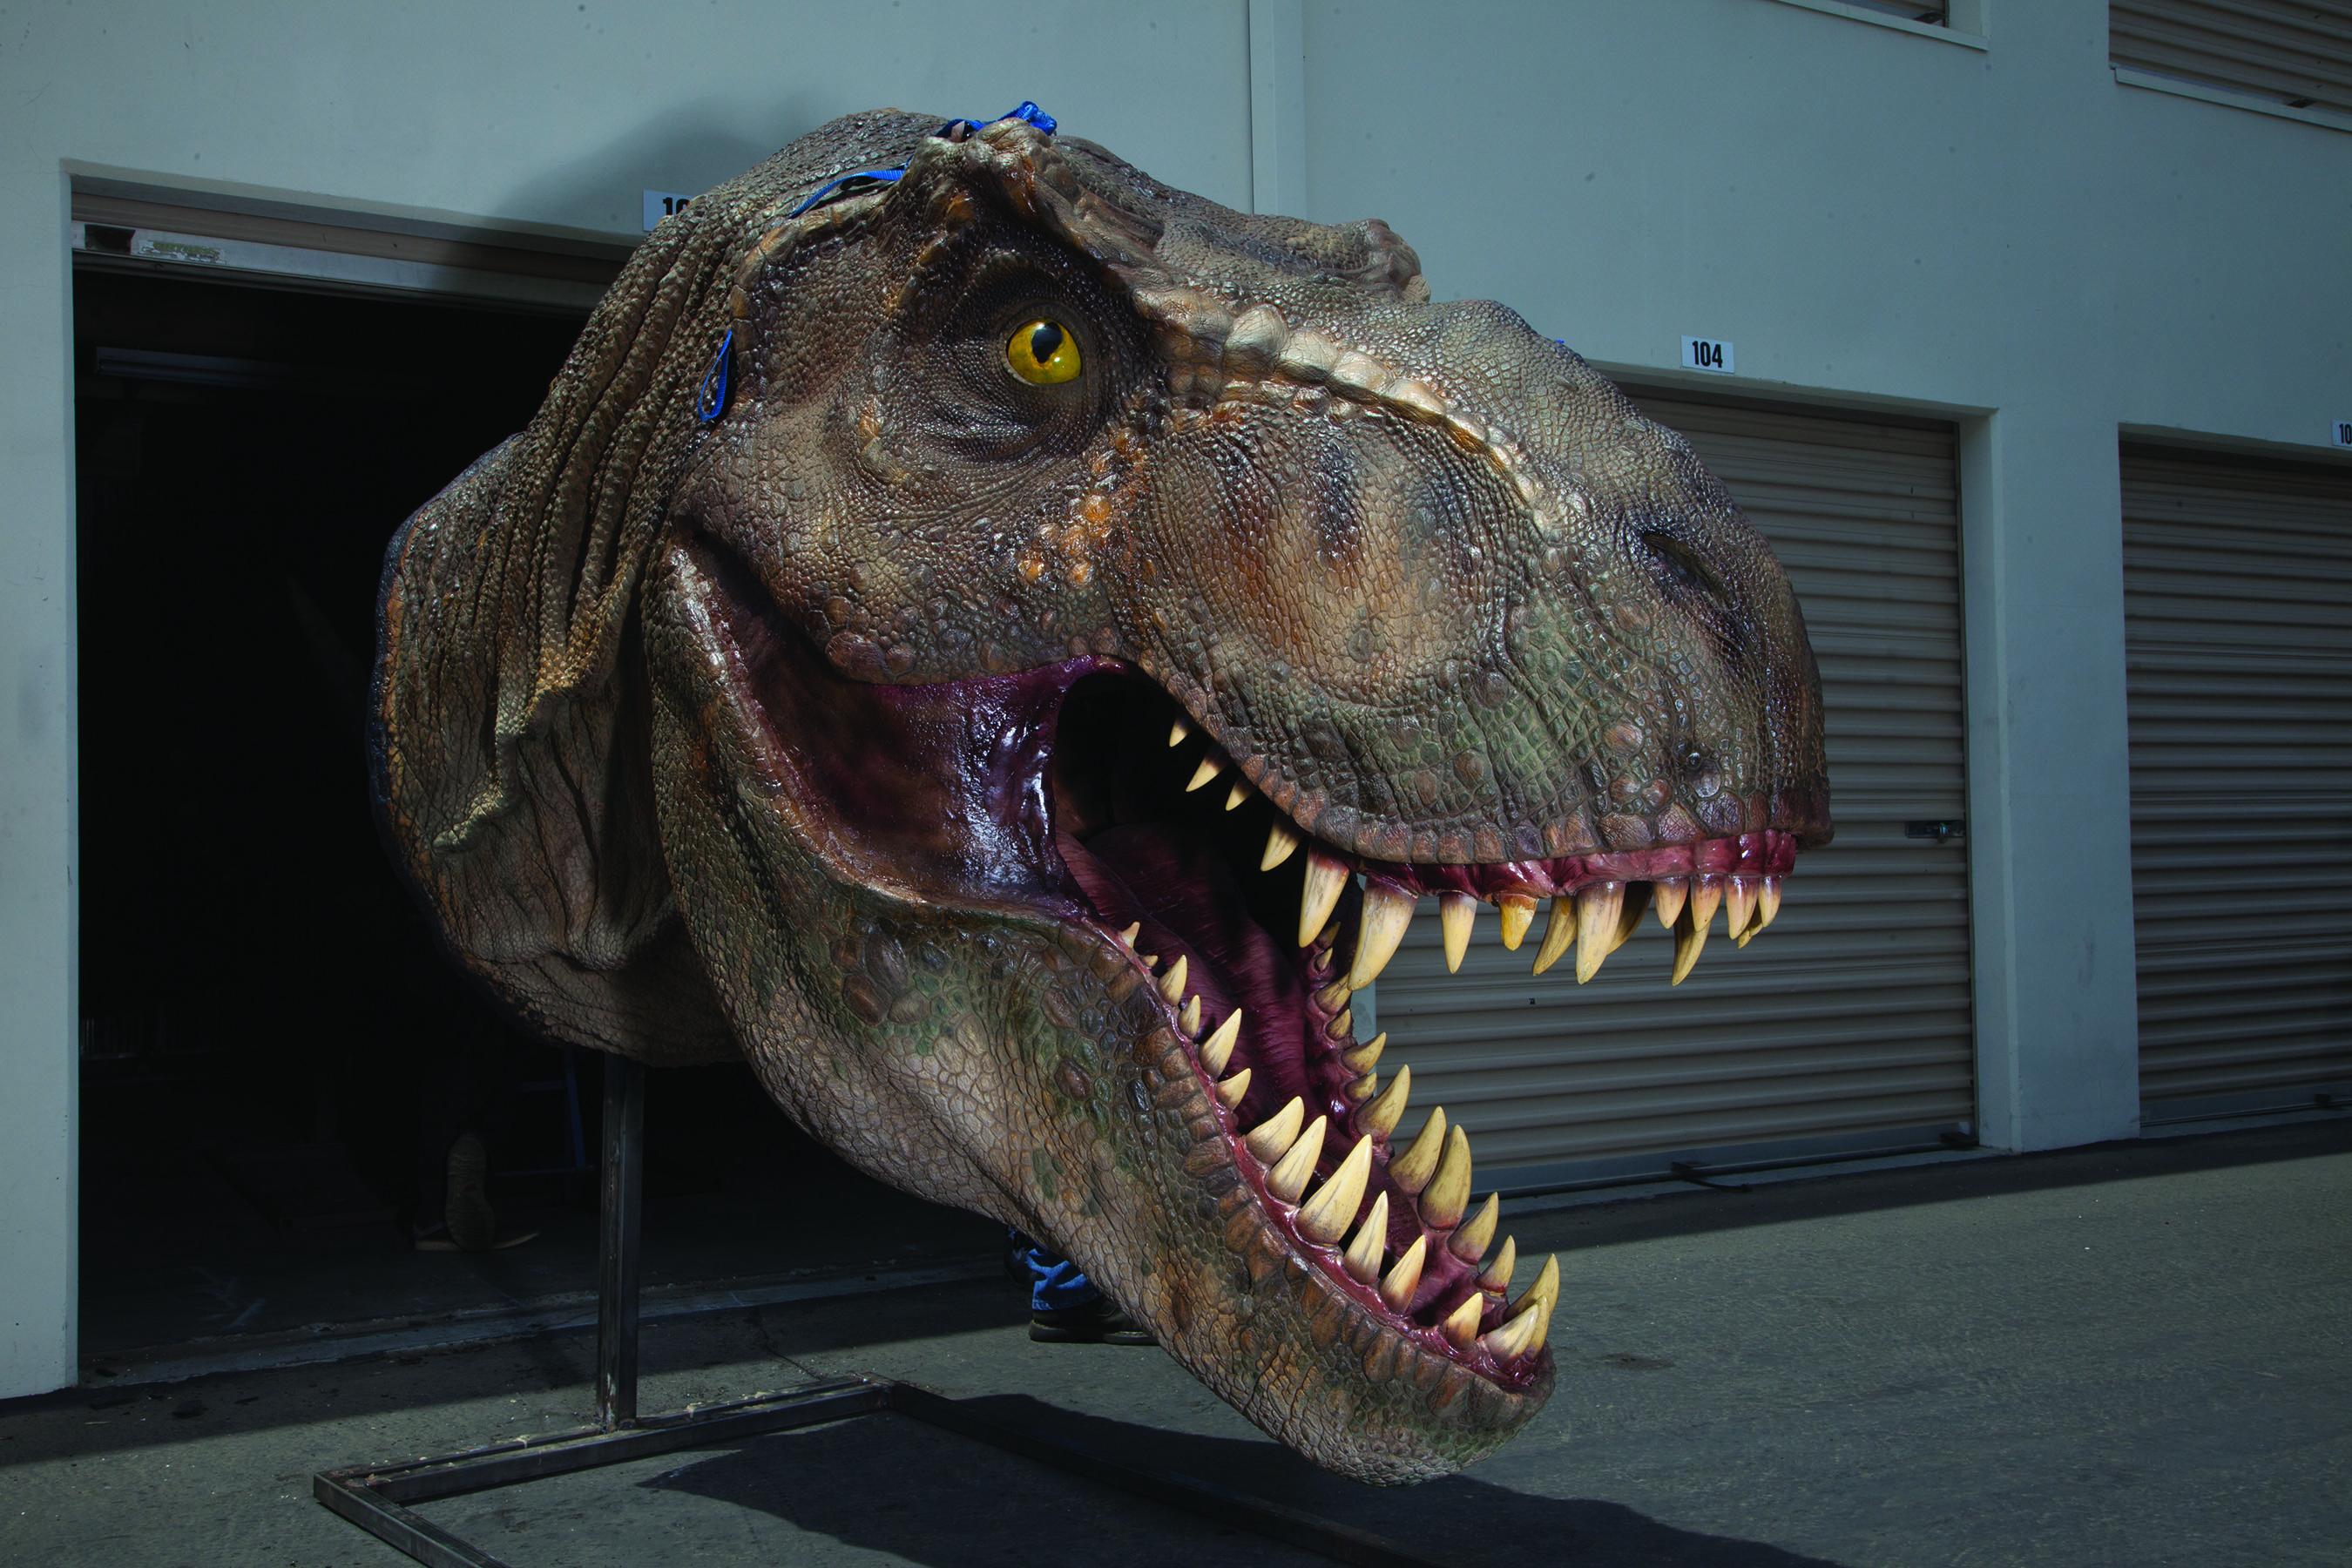 T. rex Head (Jurassic Park Movie)